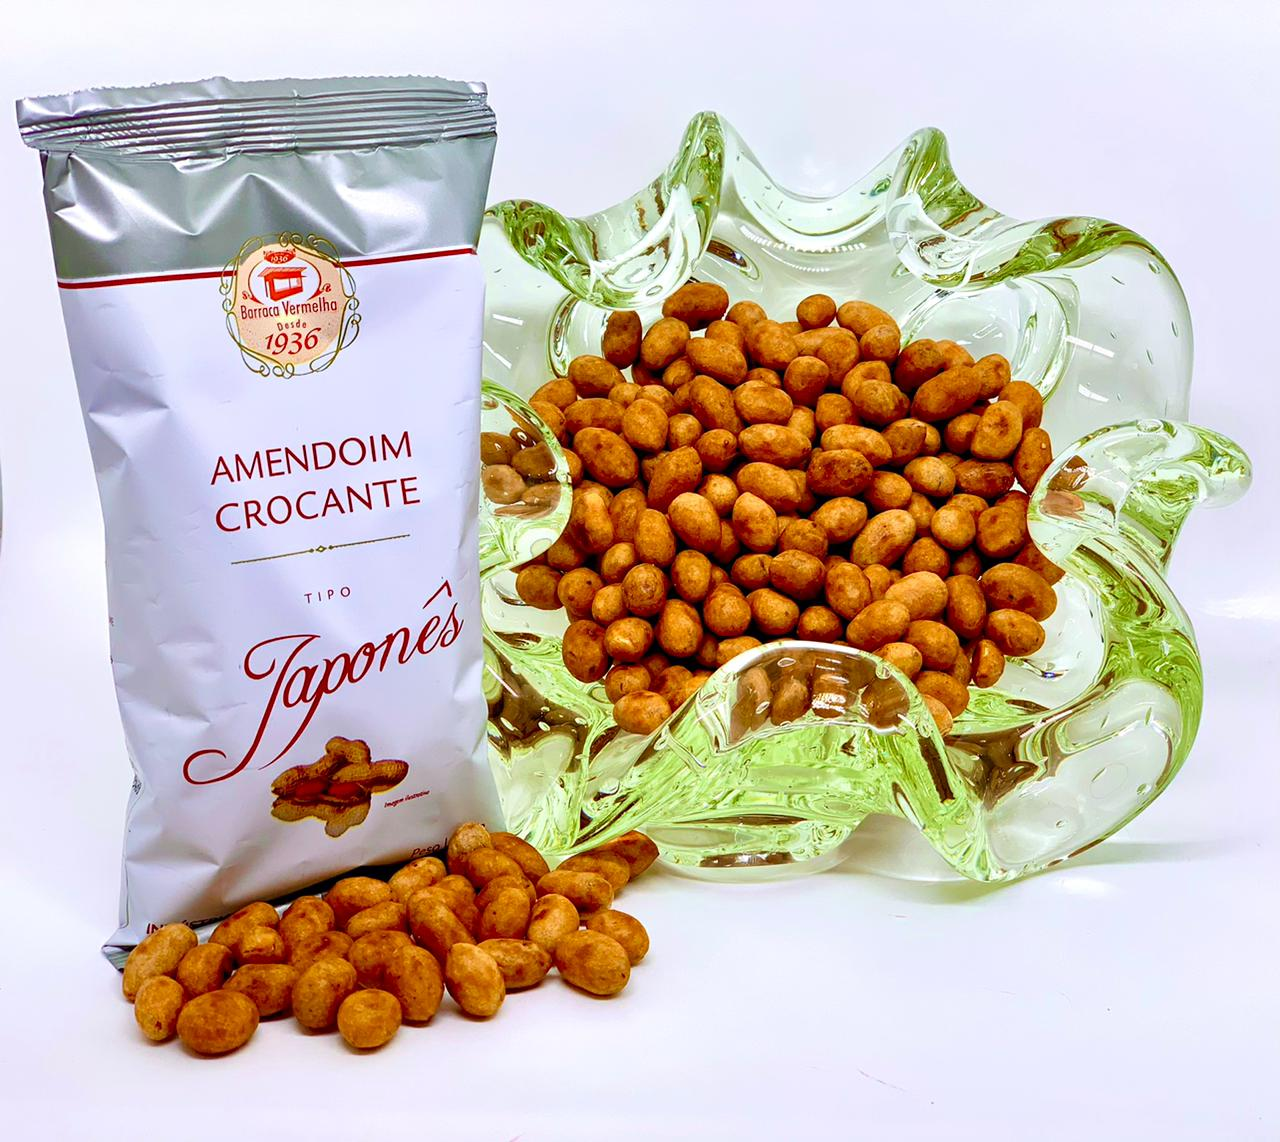 Amendoim Crocante Japonês 150 g